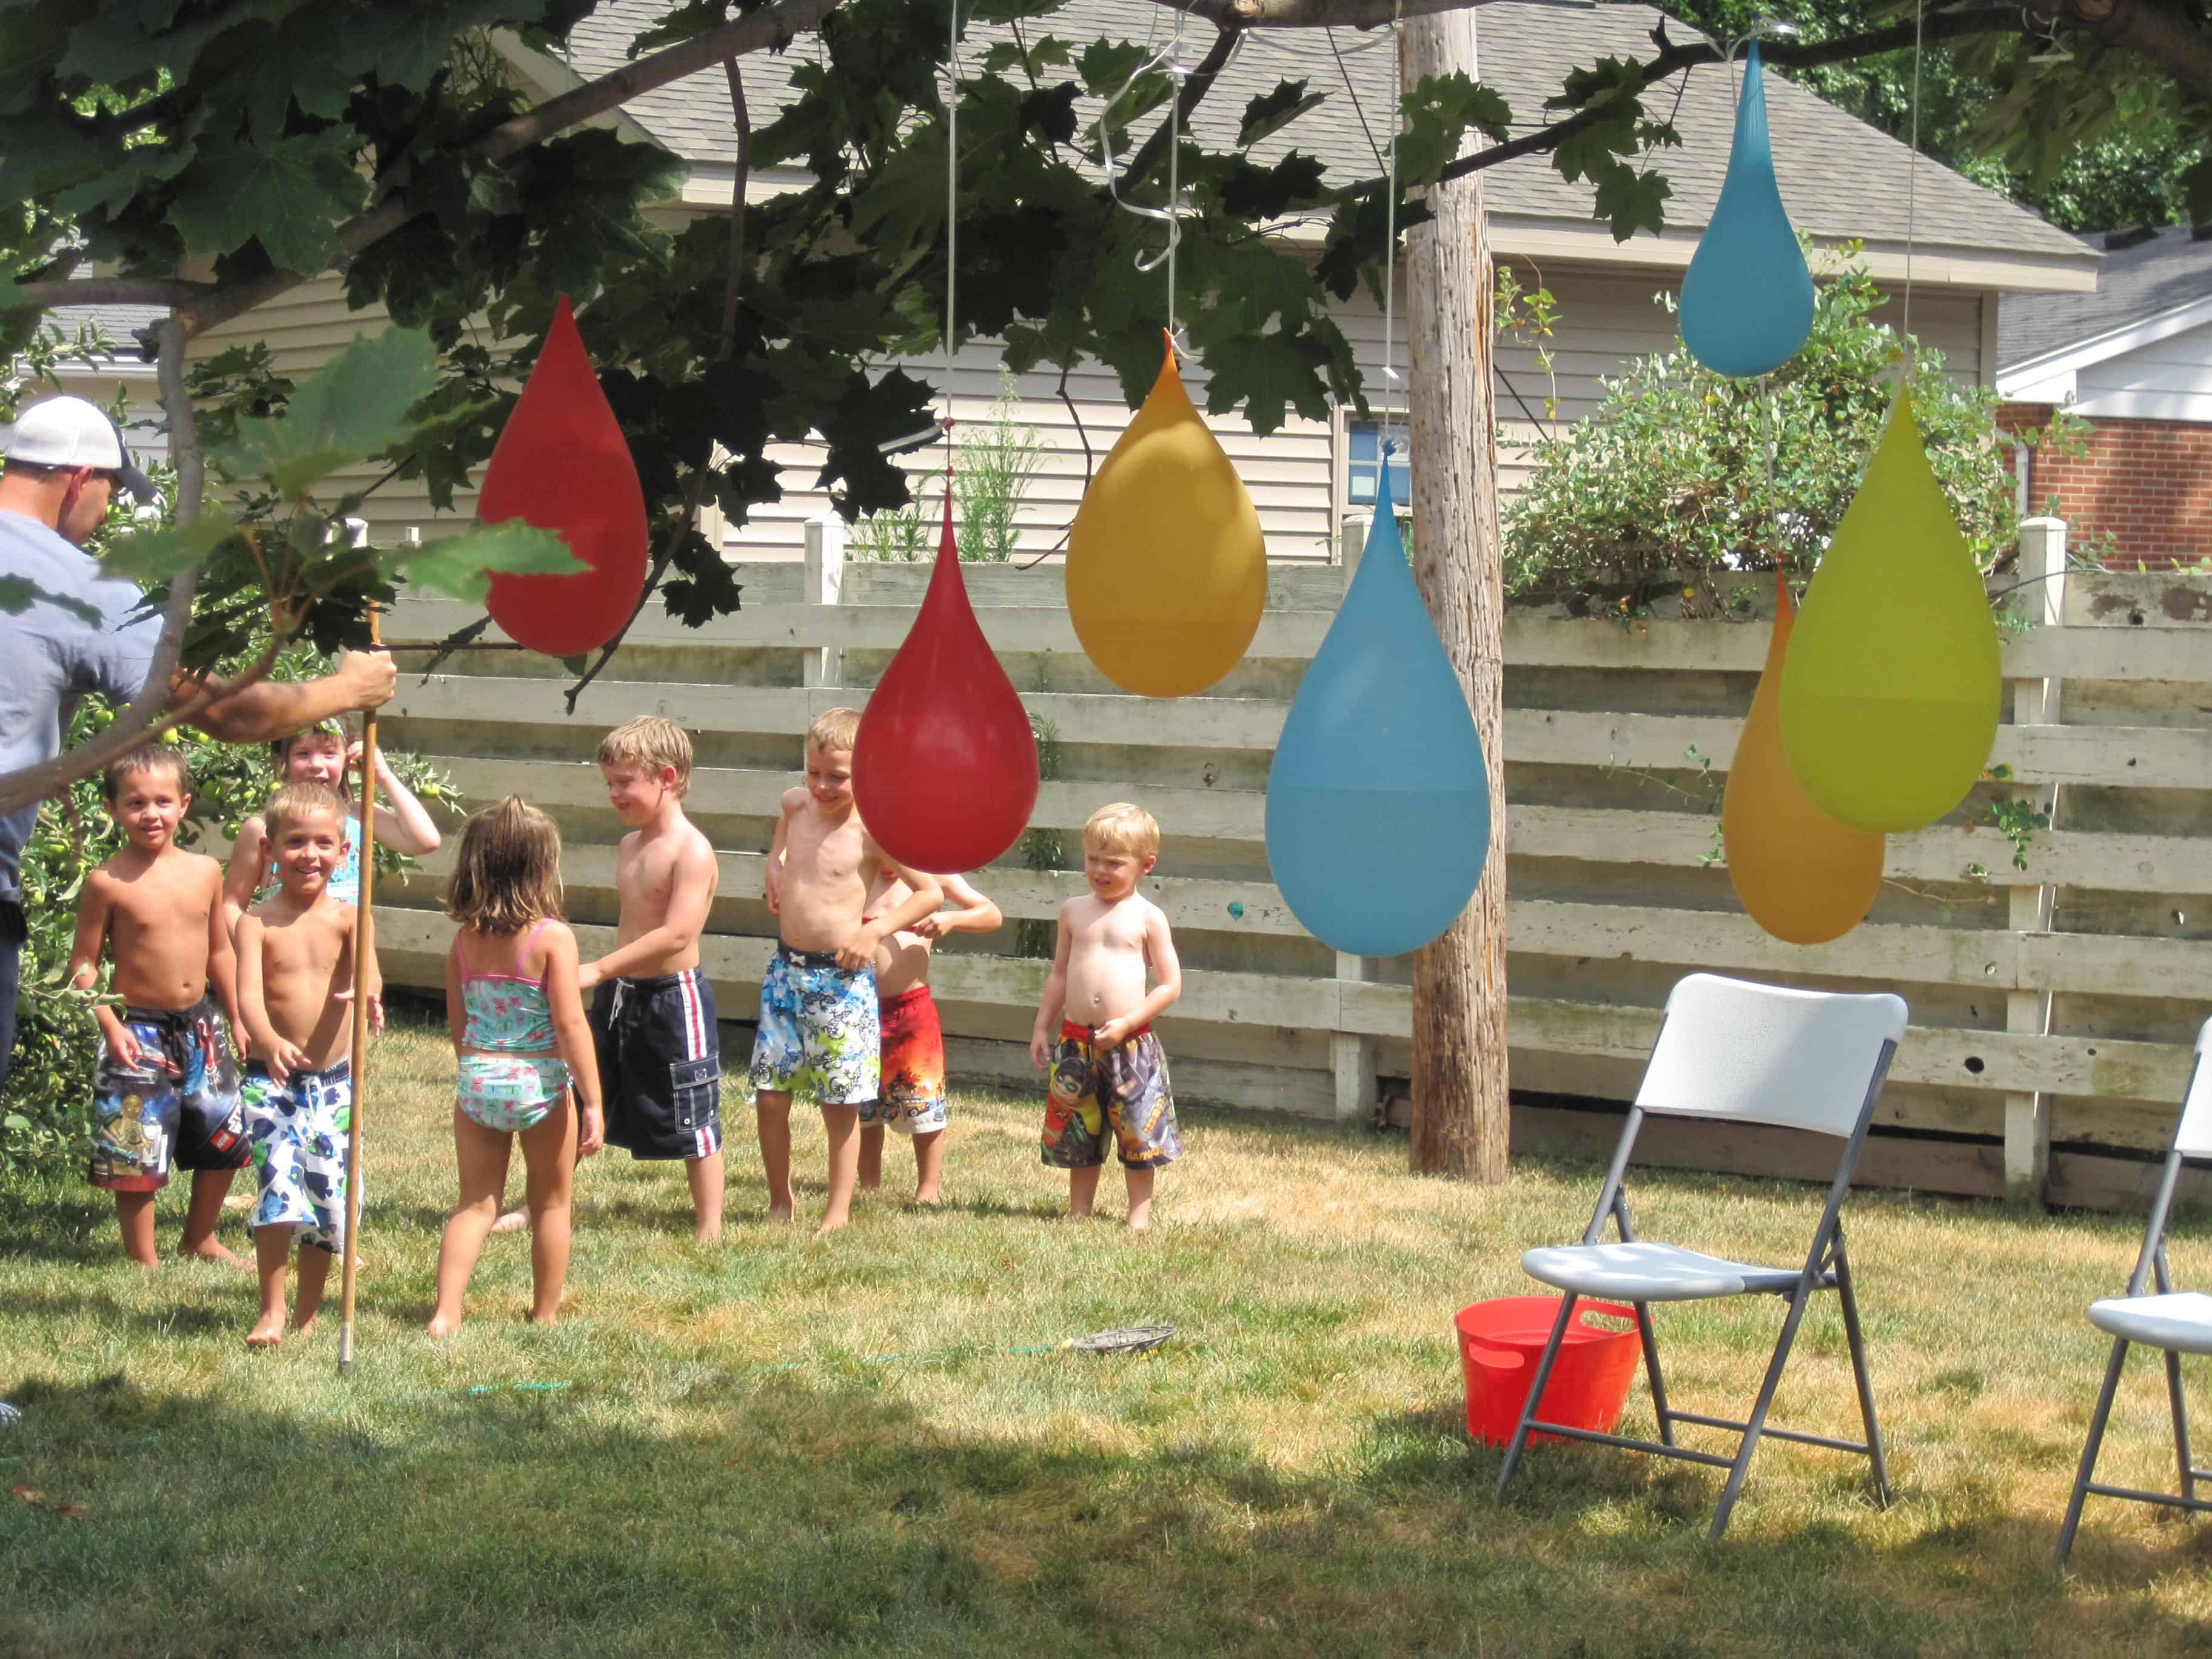 Backyard Water Party With Water Balloon Pinatas | Milk ...